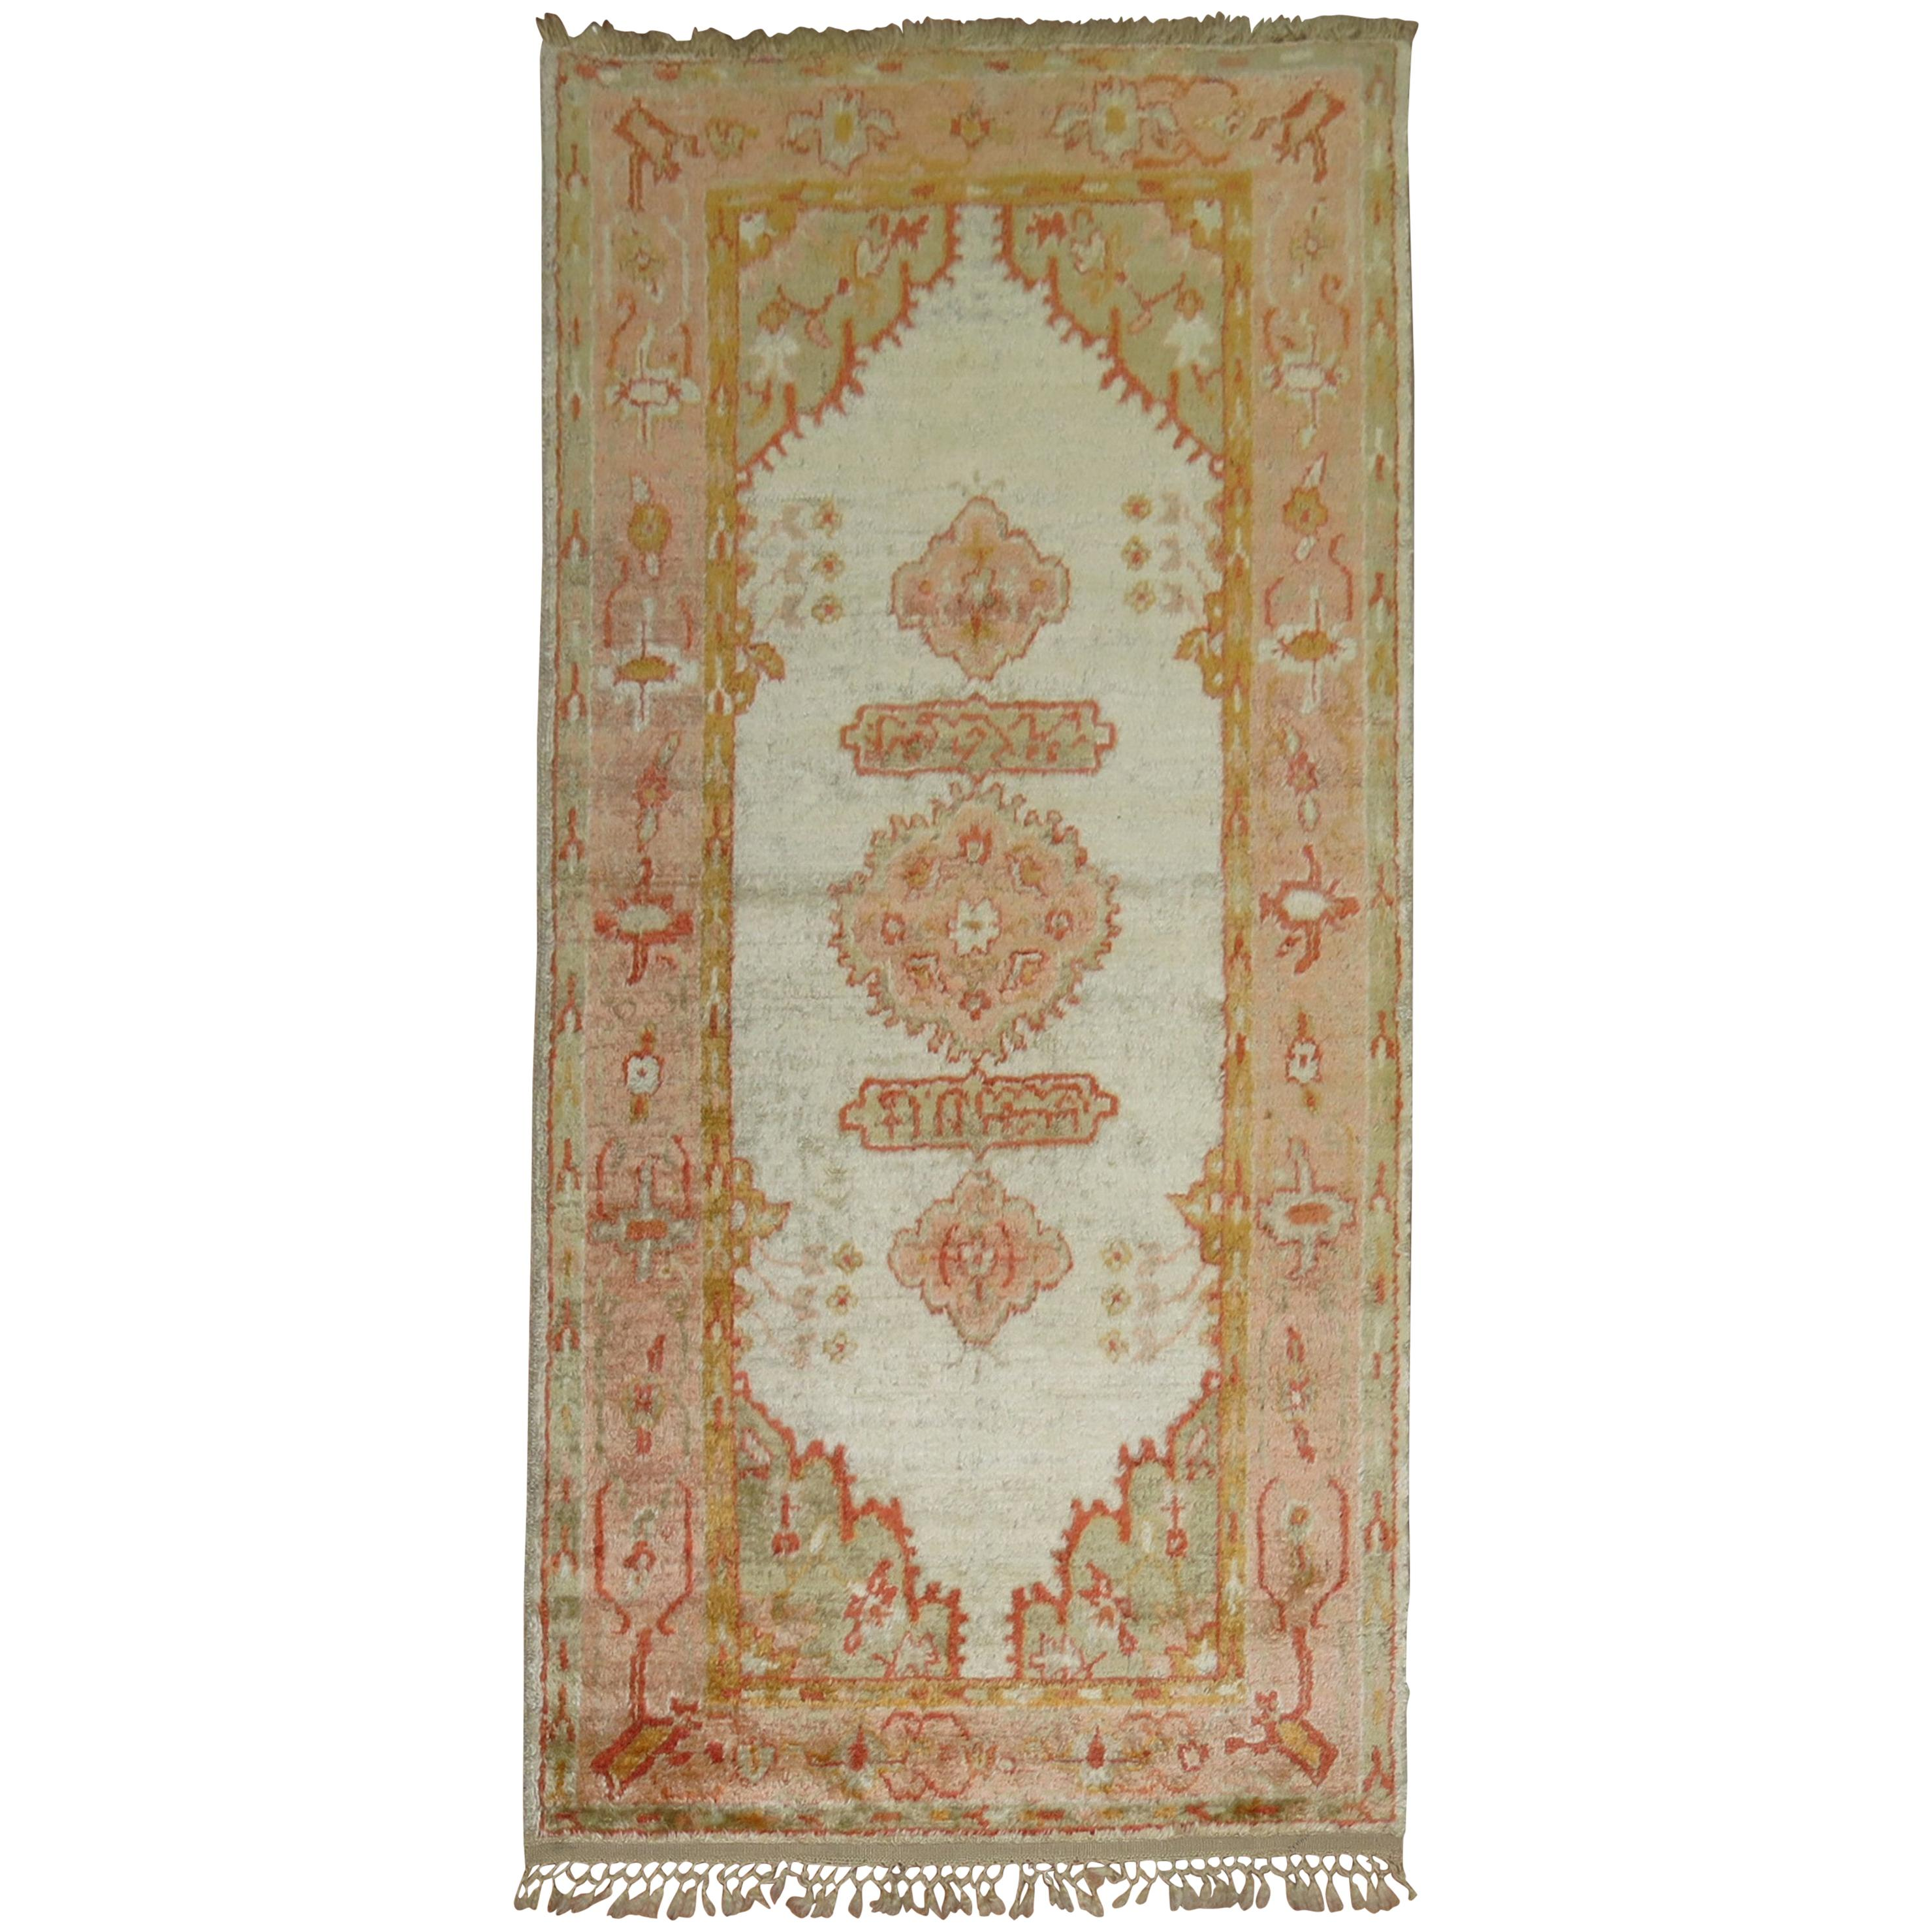 Vivacious Early 20th Century Angora Wool Oushak Rug